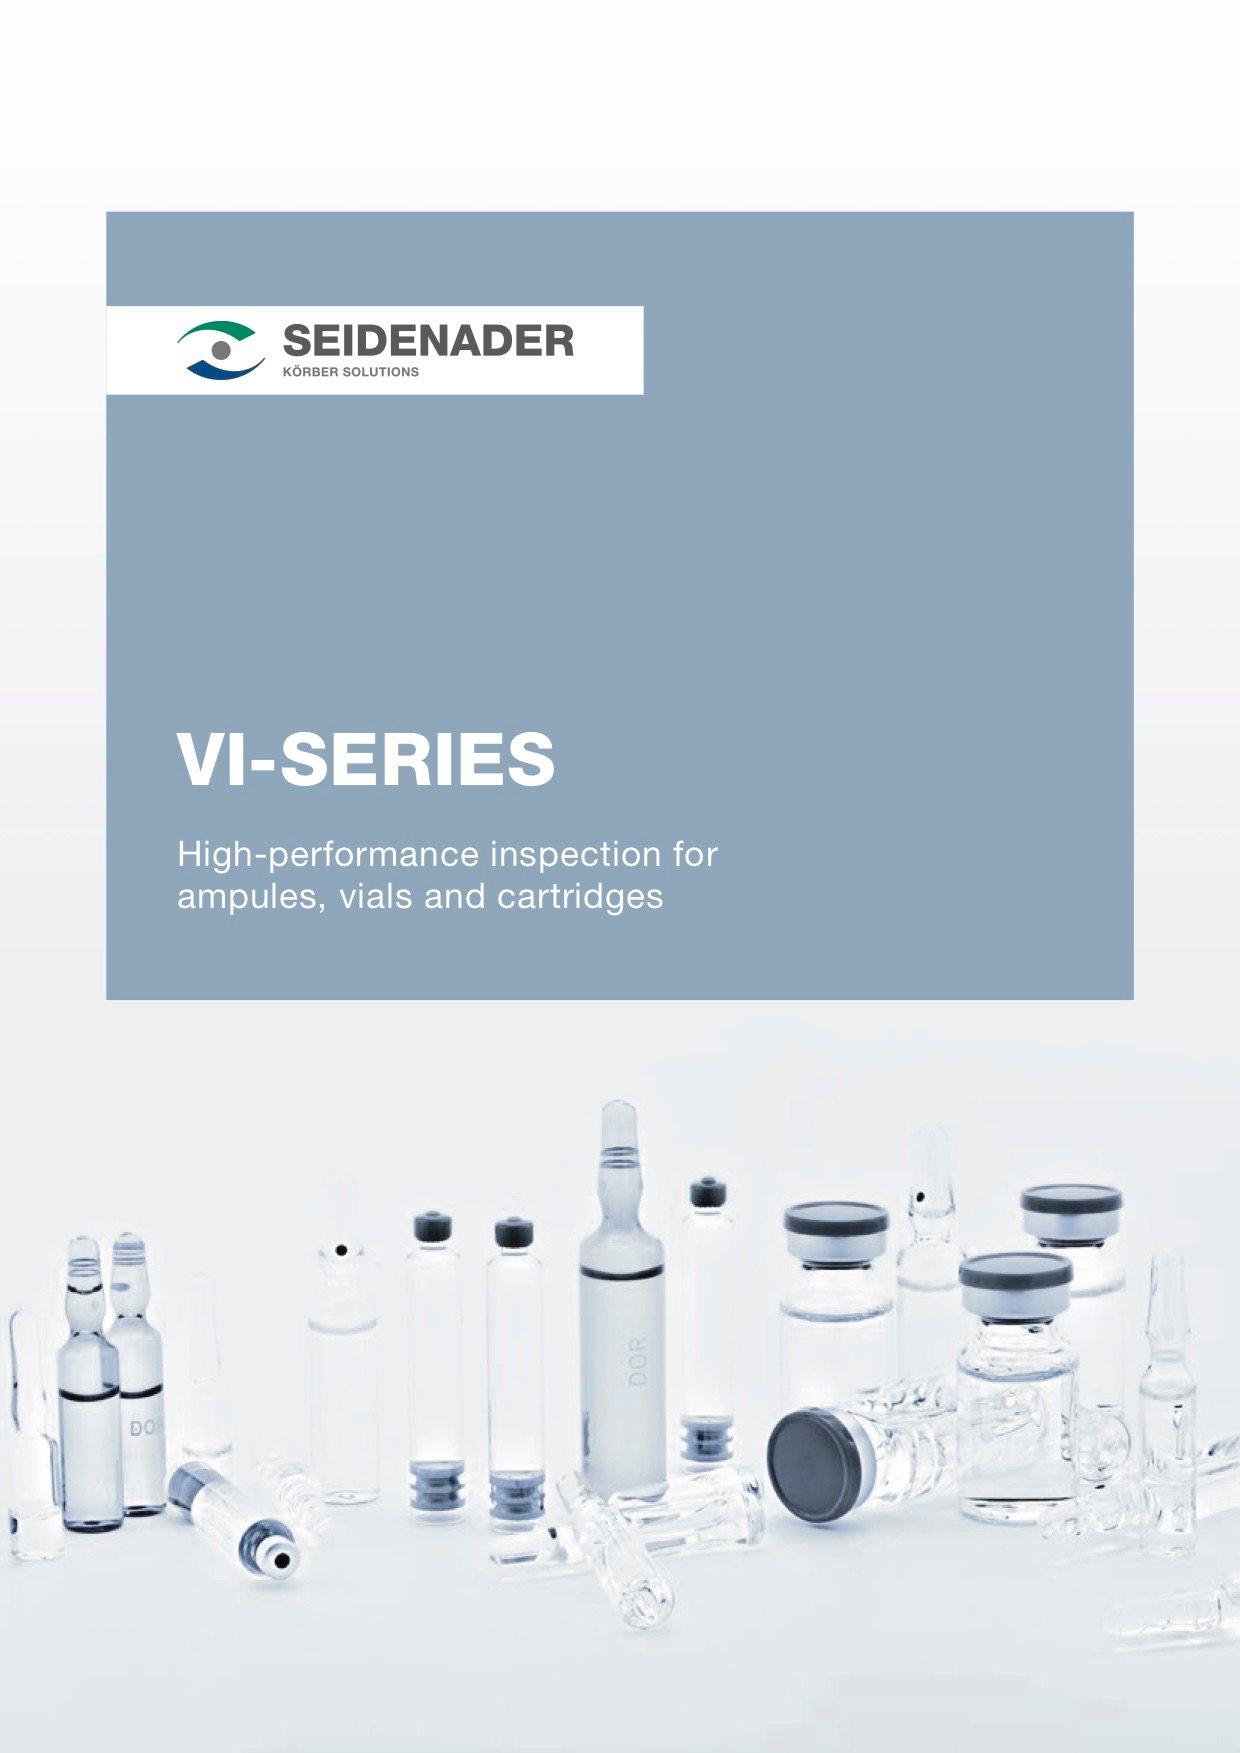 Seidenader_Automatic-Inspection_VI-Series_2018